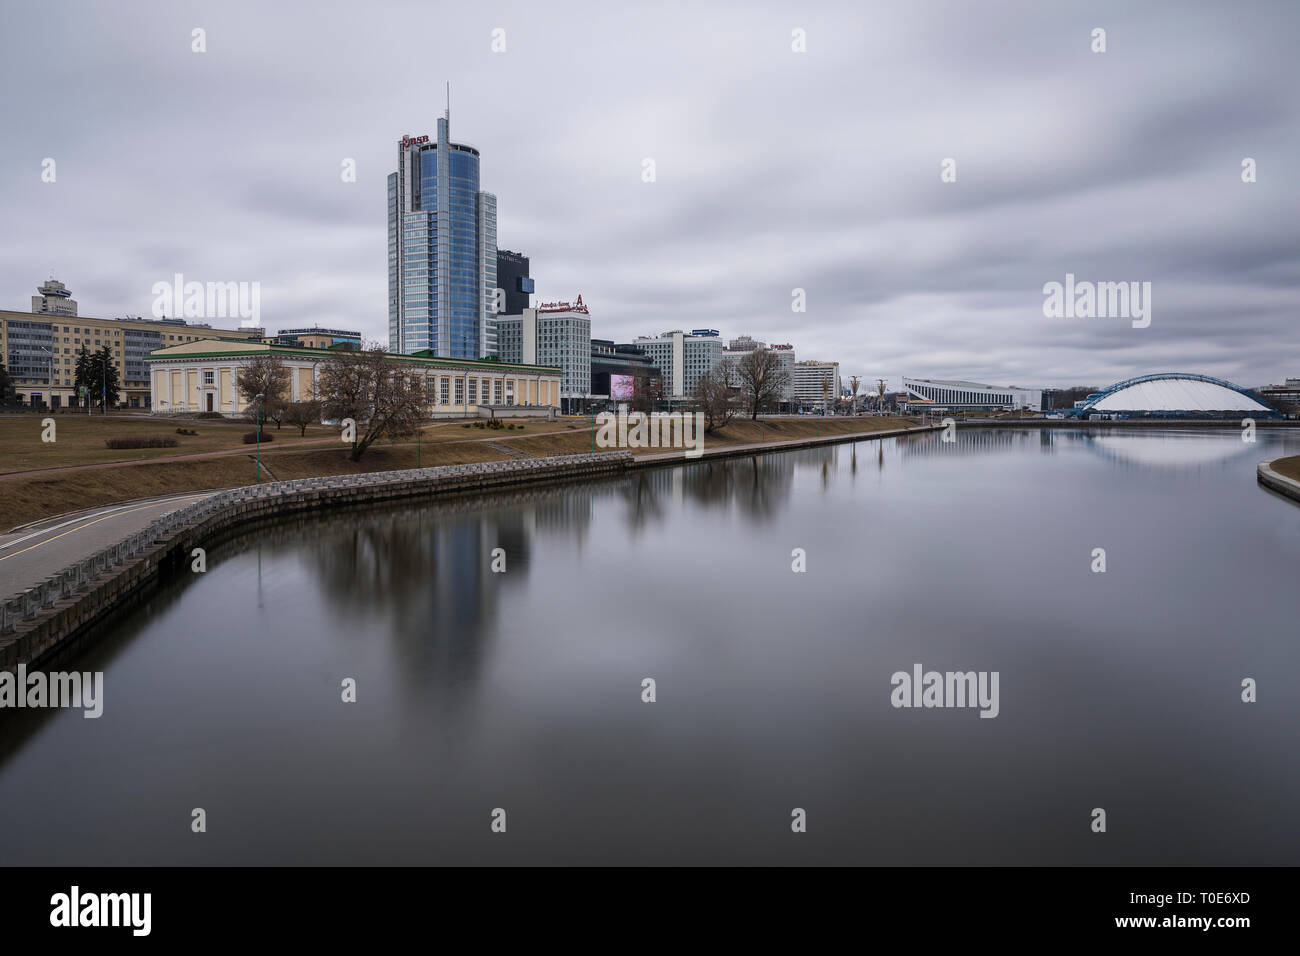 Skyline of Minsk - Stock Image